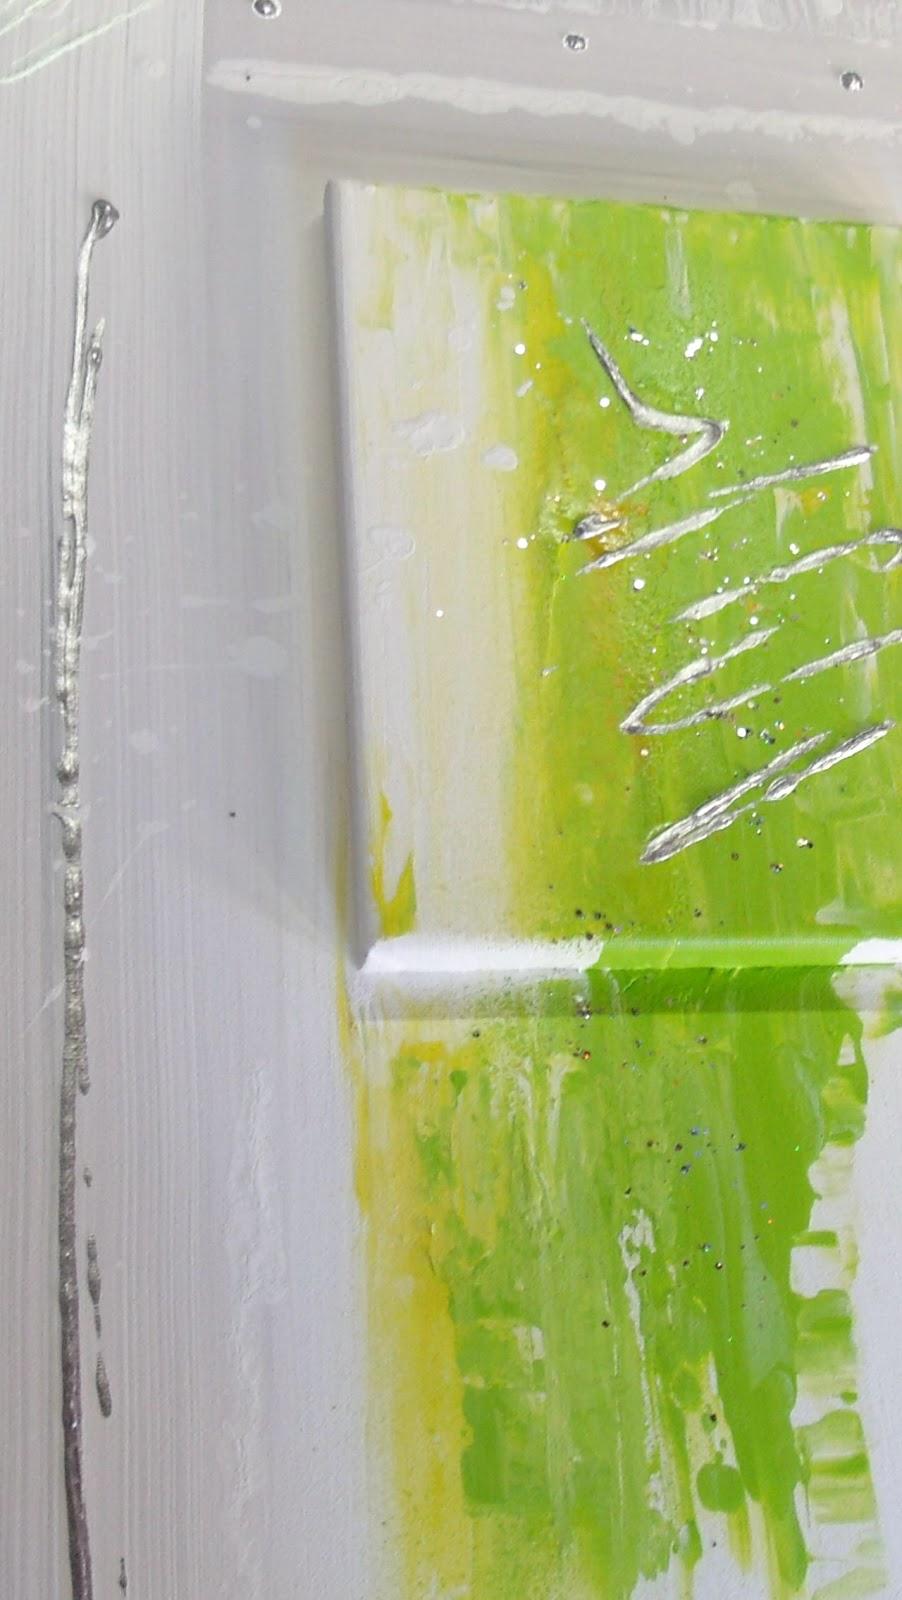 Tableaux abstrait new design vert anis